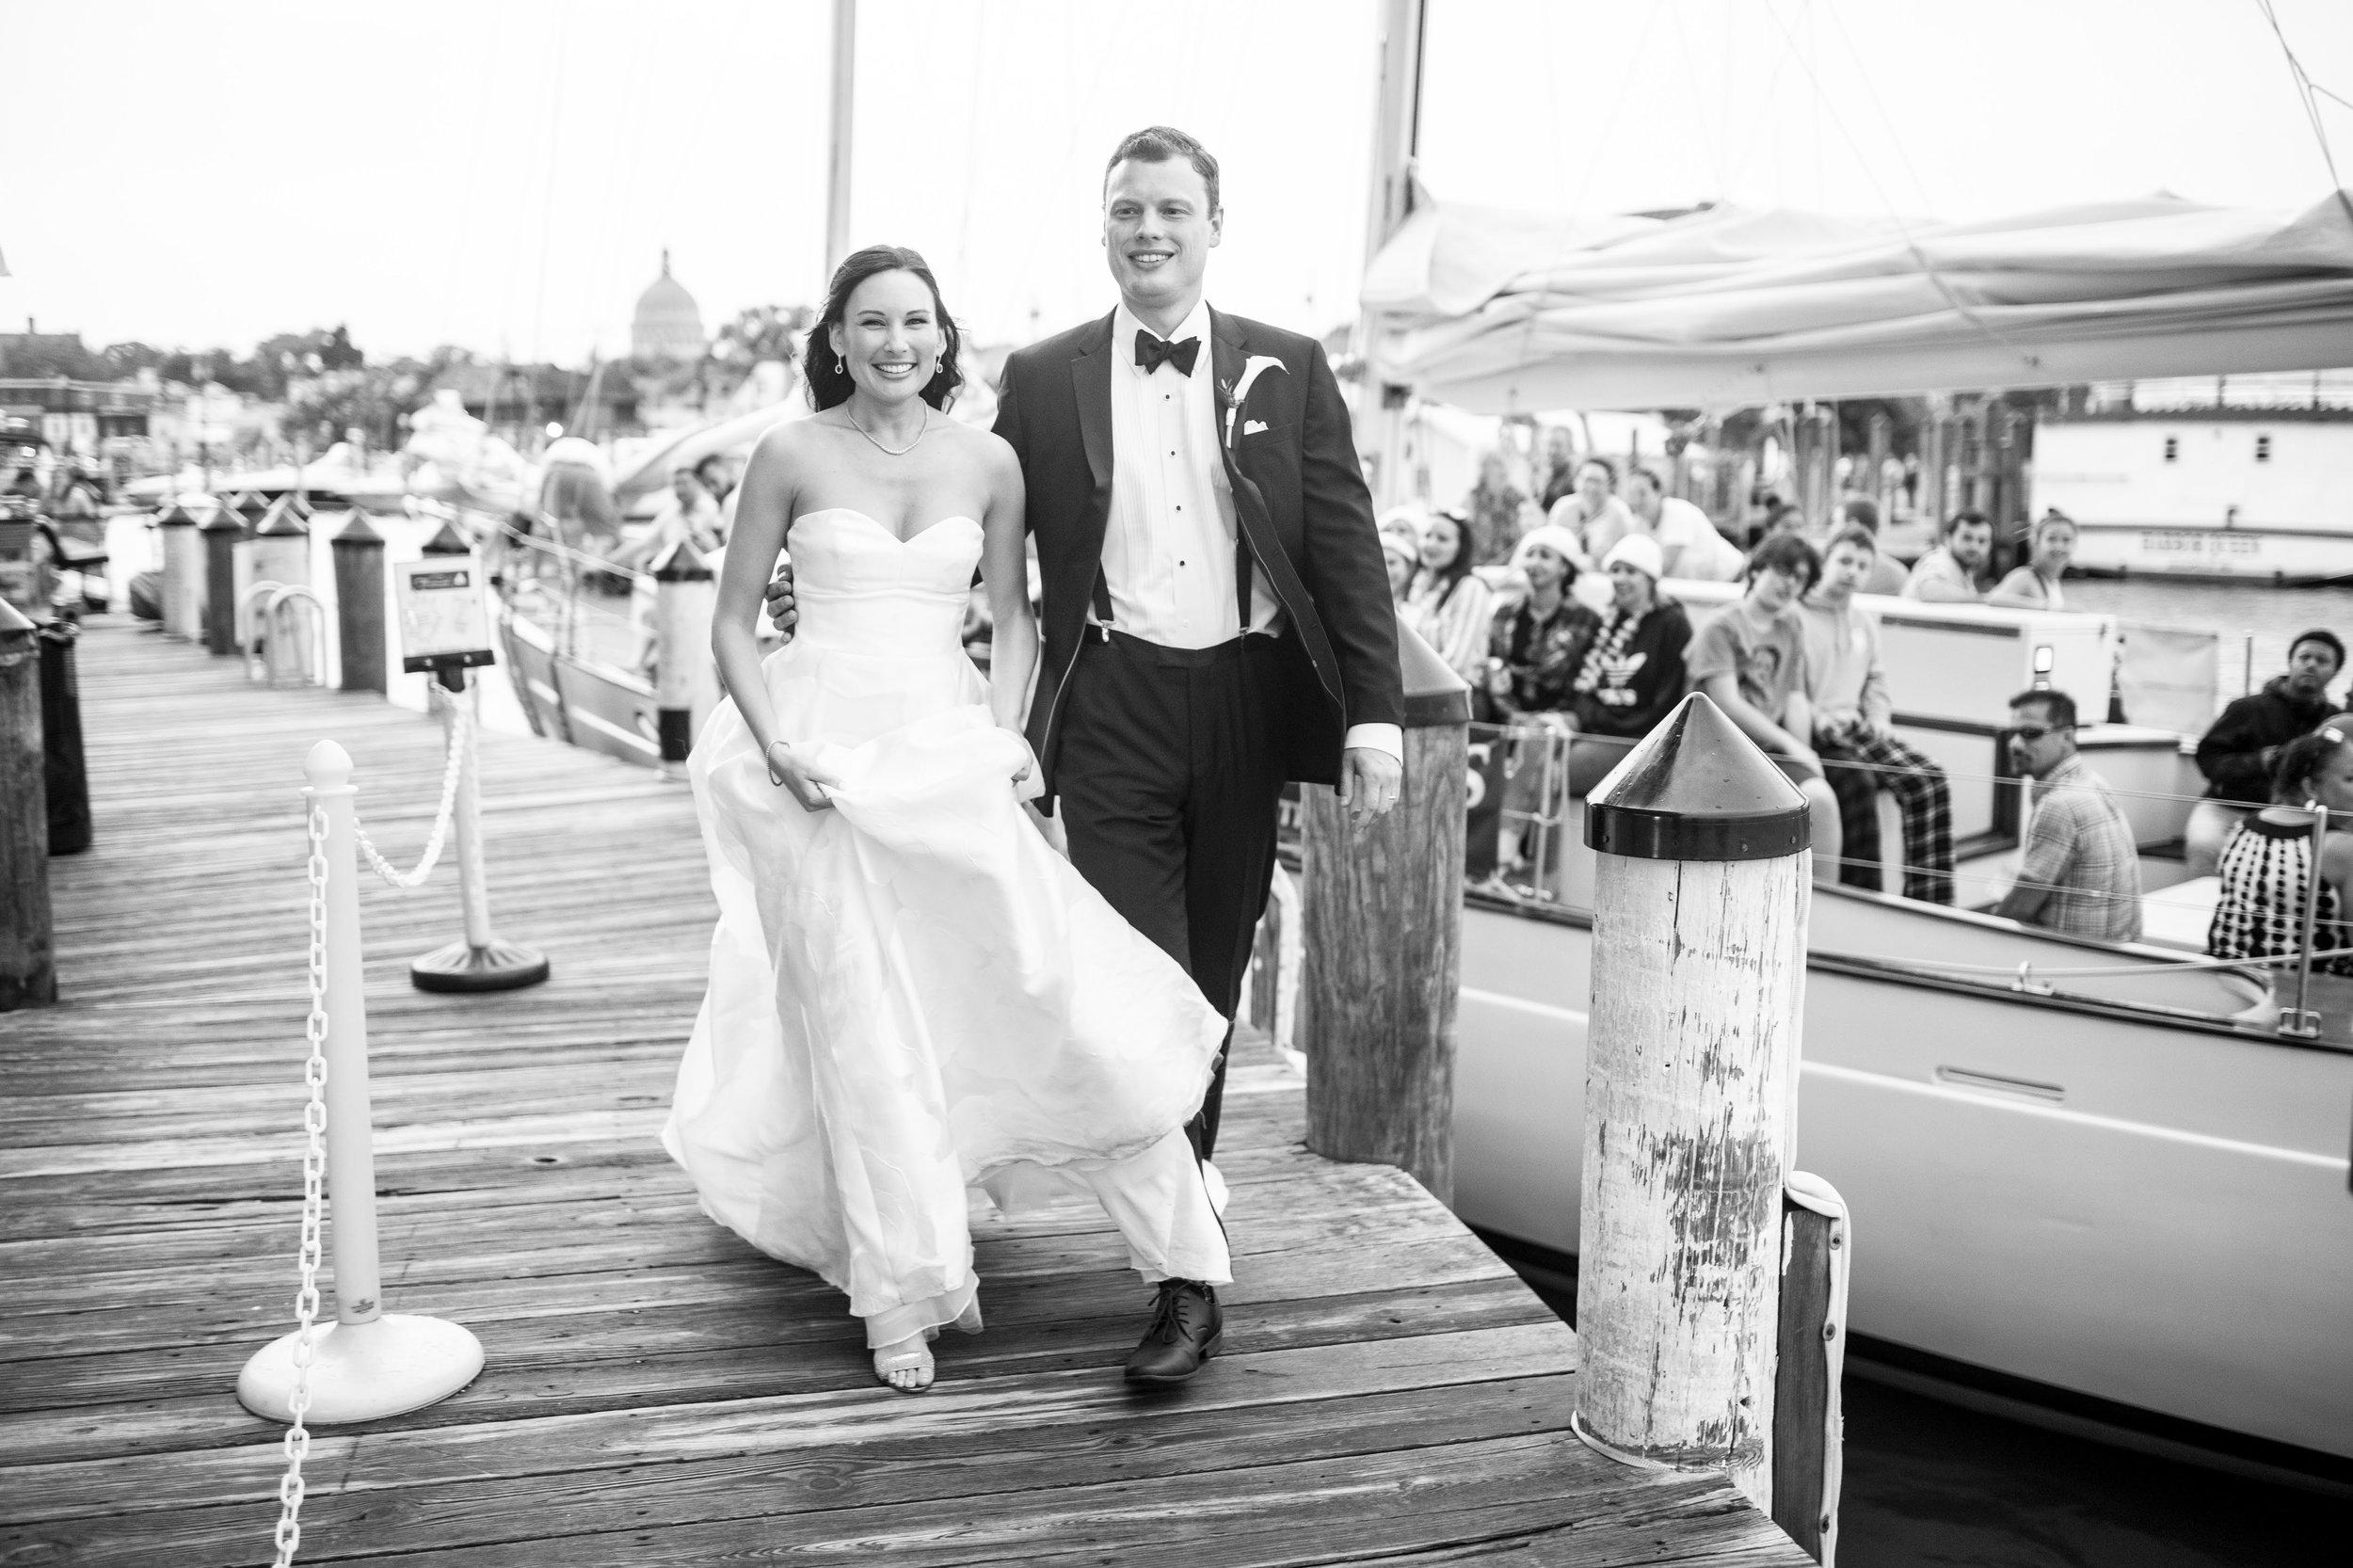 097-annapolis-waterfront-hotel-paca-house-wedding-4M2A4563.JPG